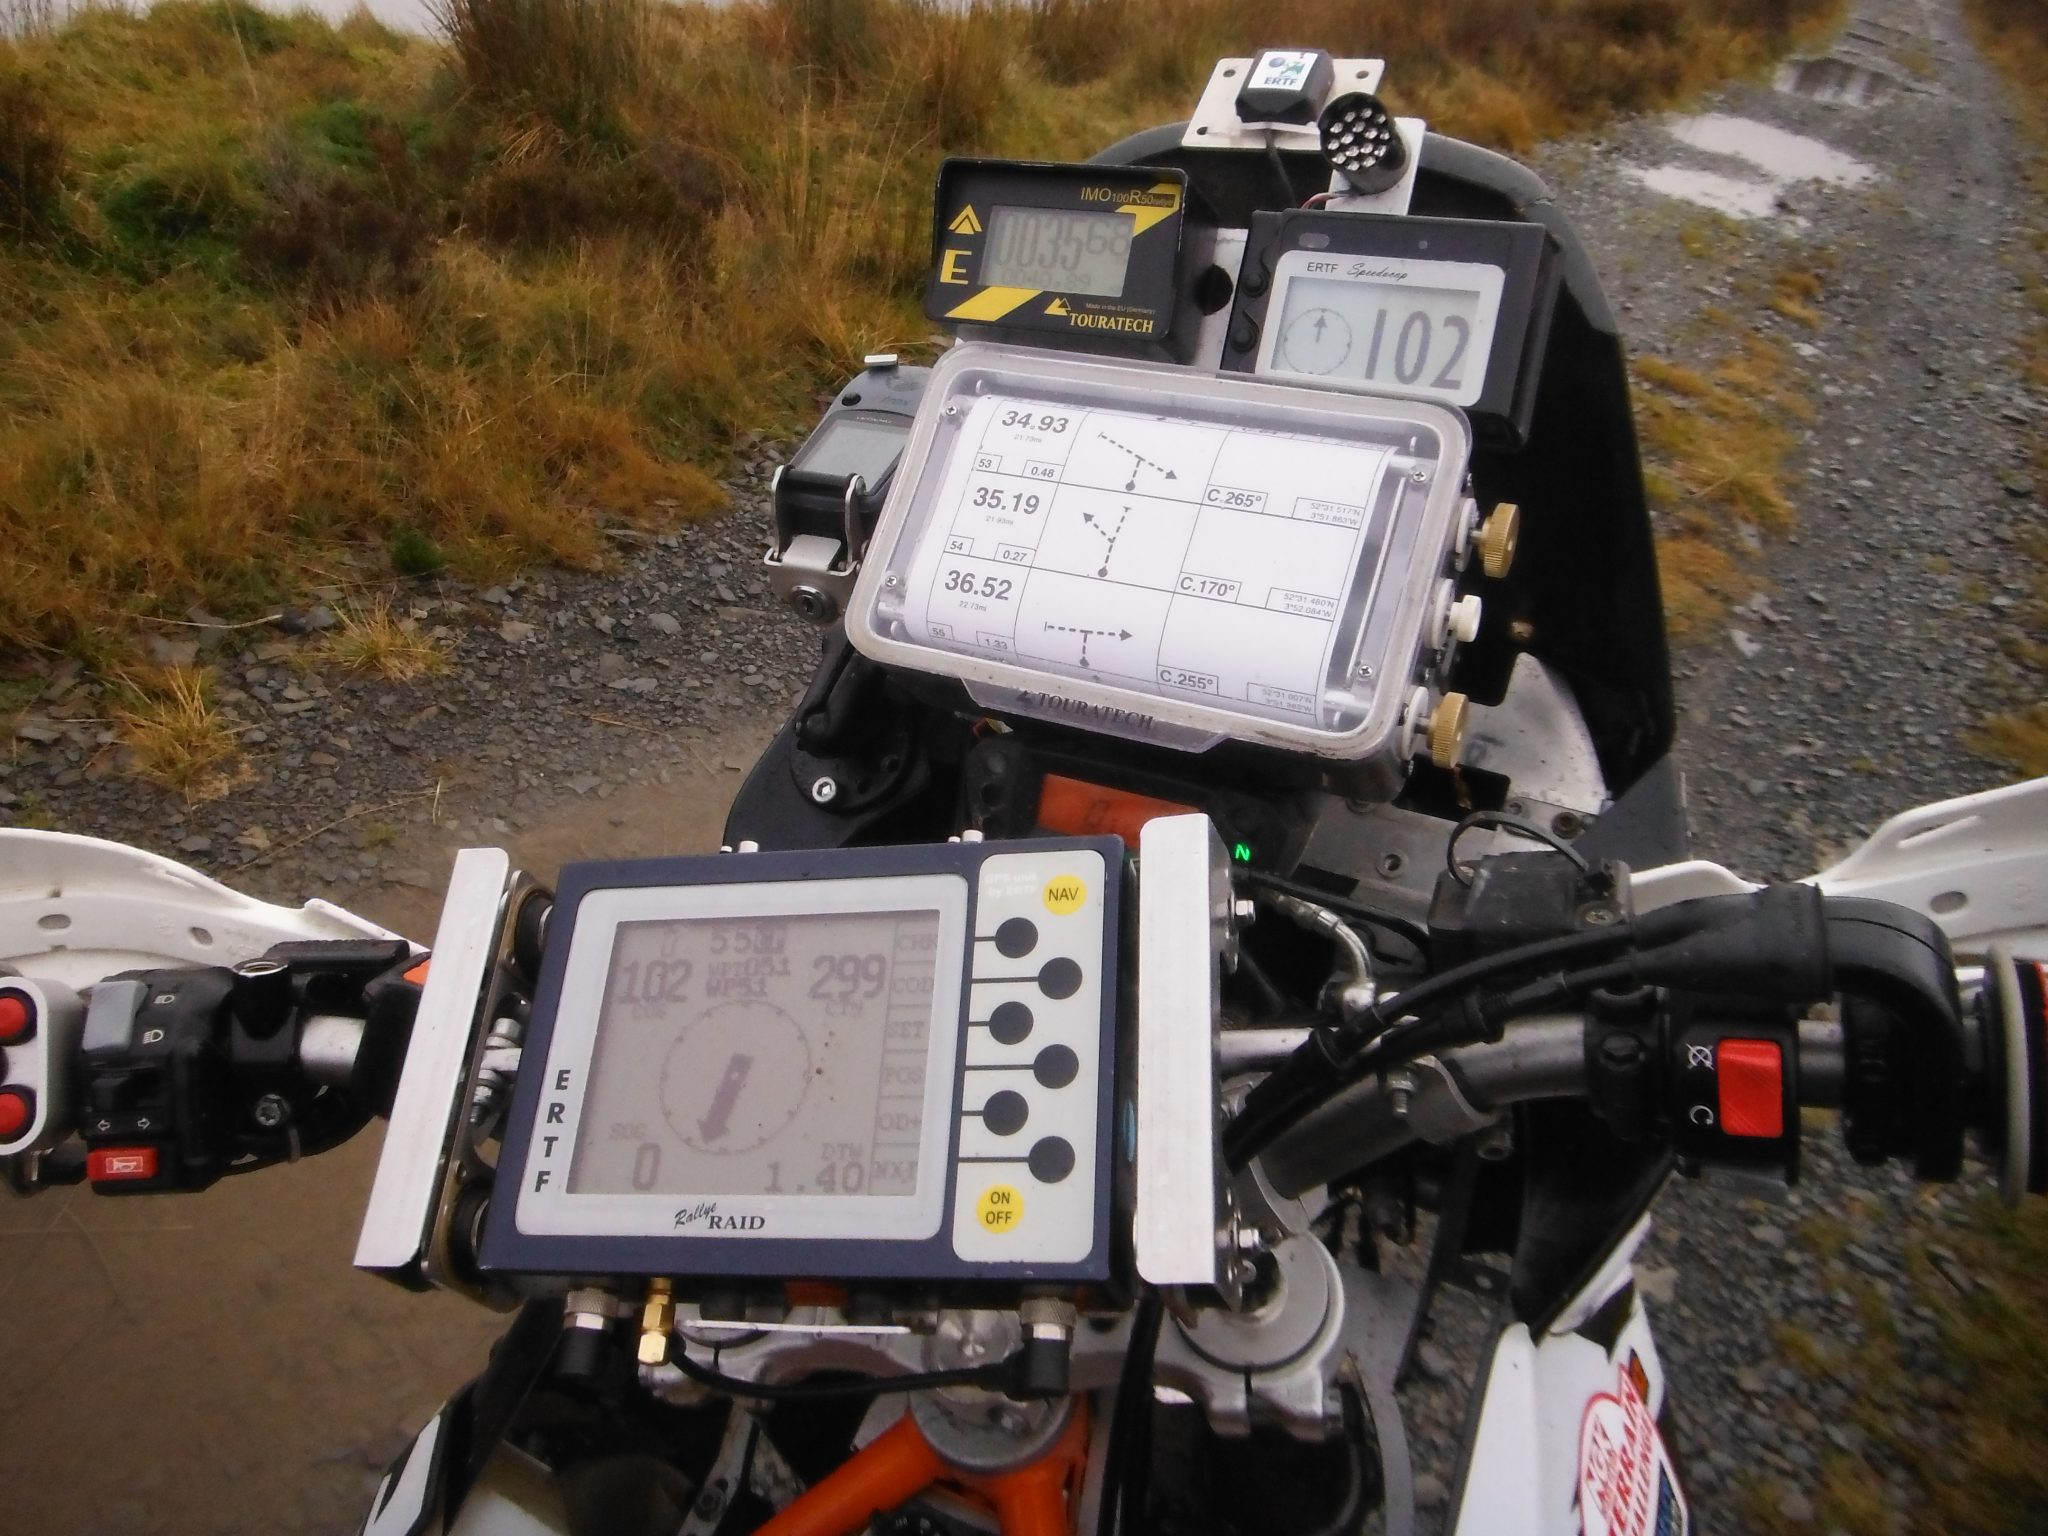 New for Pikes Peak 2014 – roadbook option